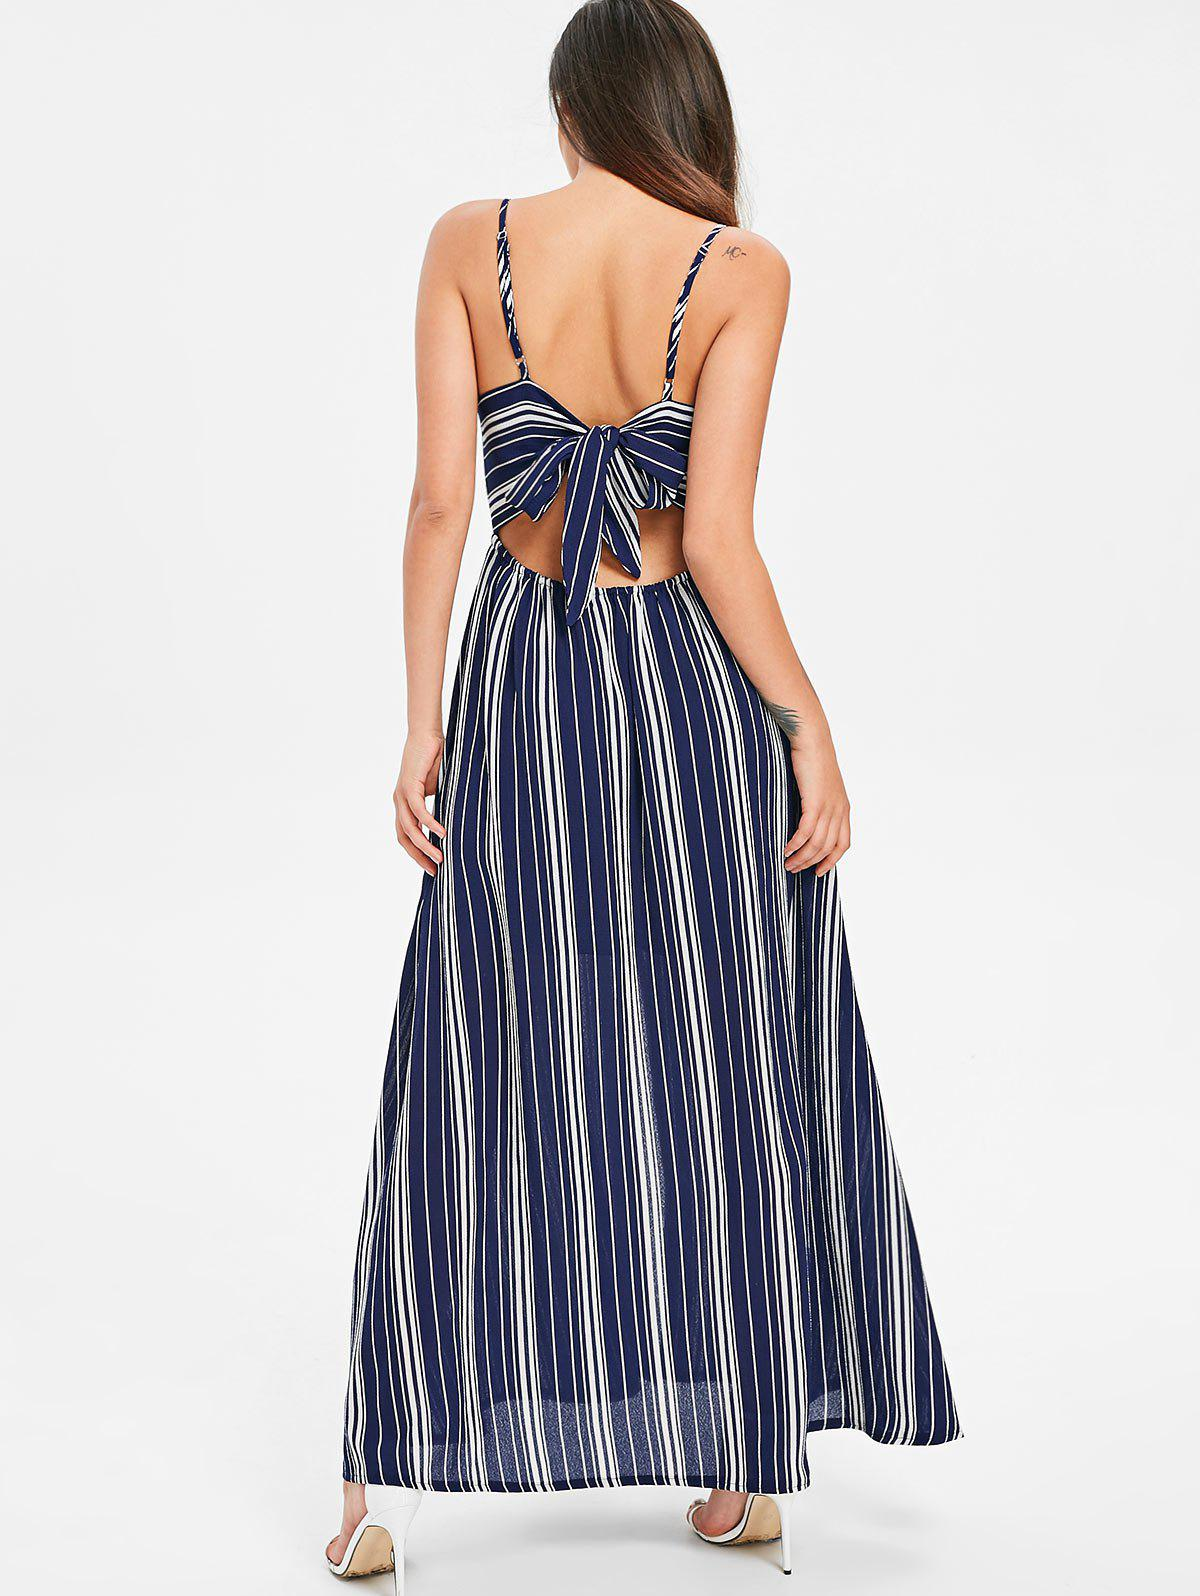 Black Colorblock Centered 2-Tone Stripe Cami Long Maxi Dress